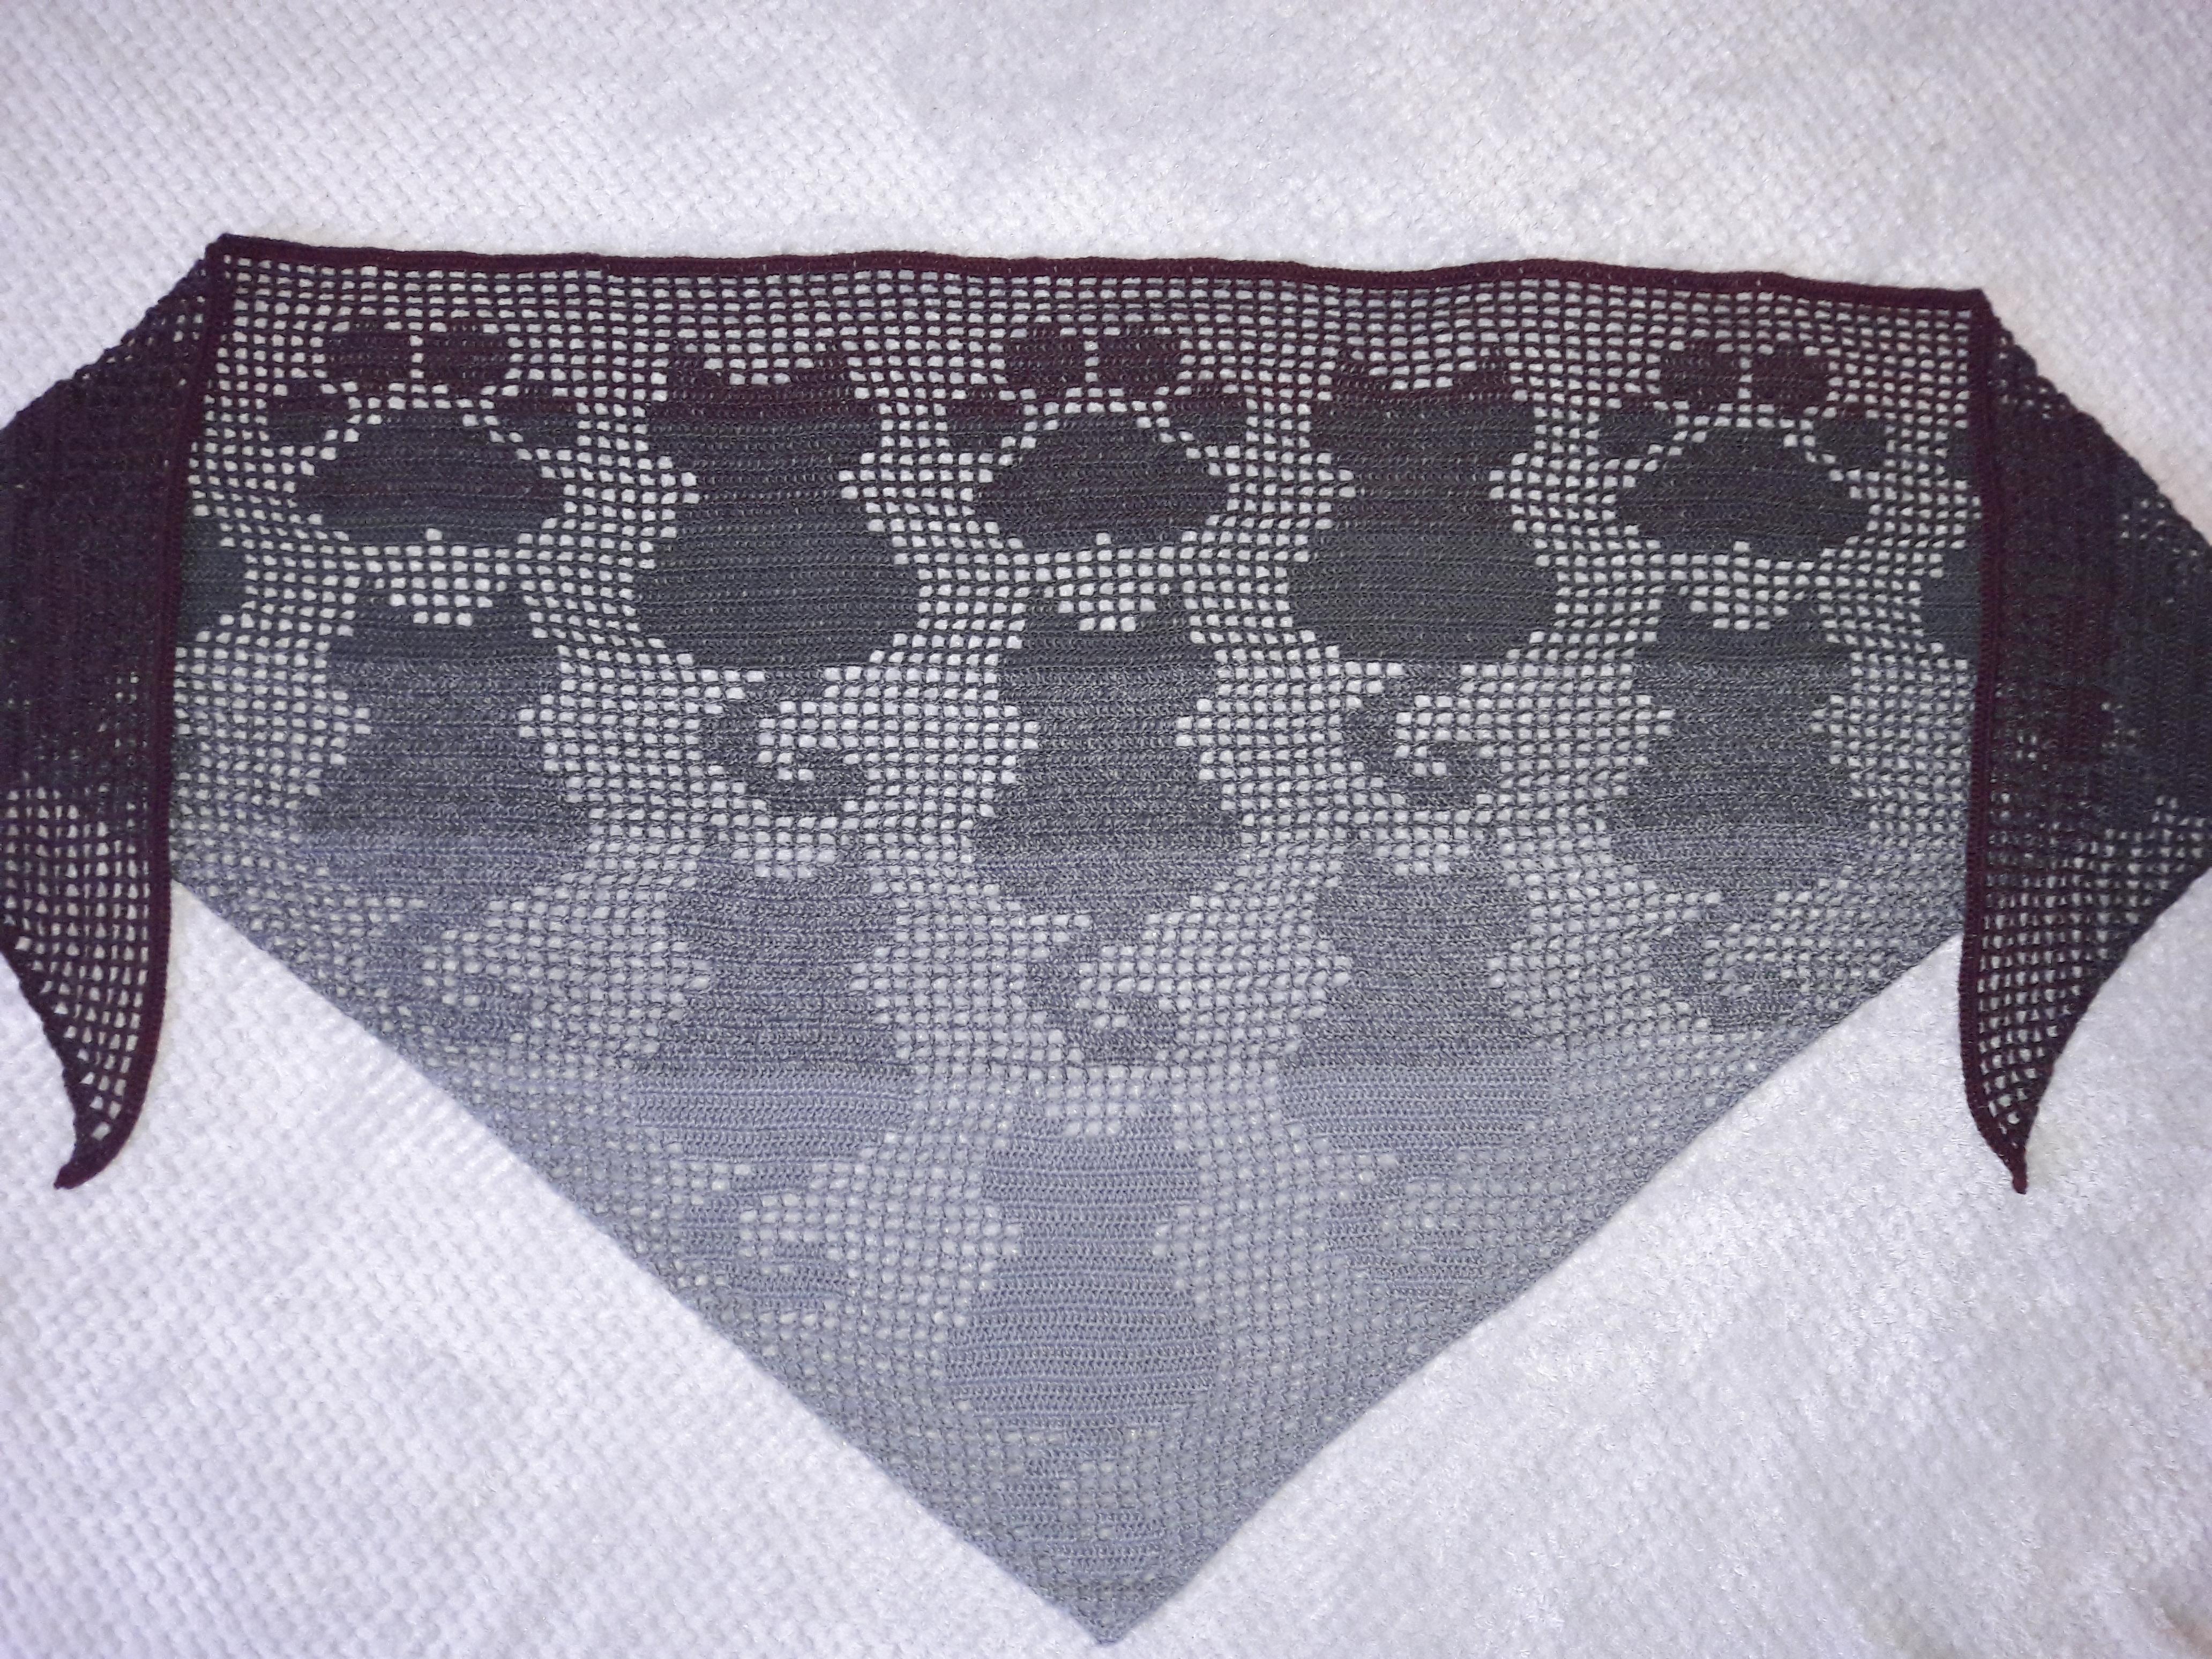 Crochet Cat Towel Series UK Archives • Kerri's Crochet | 3096x4128